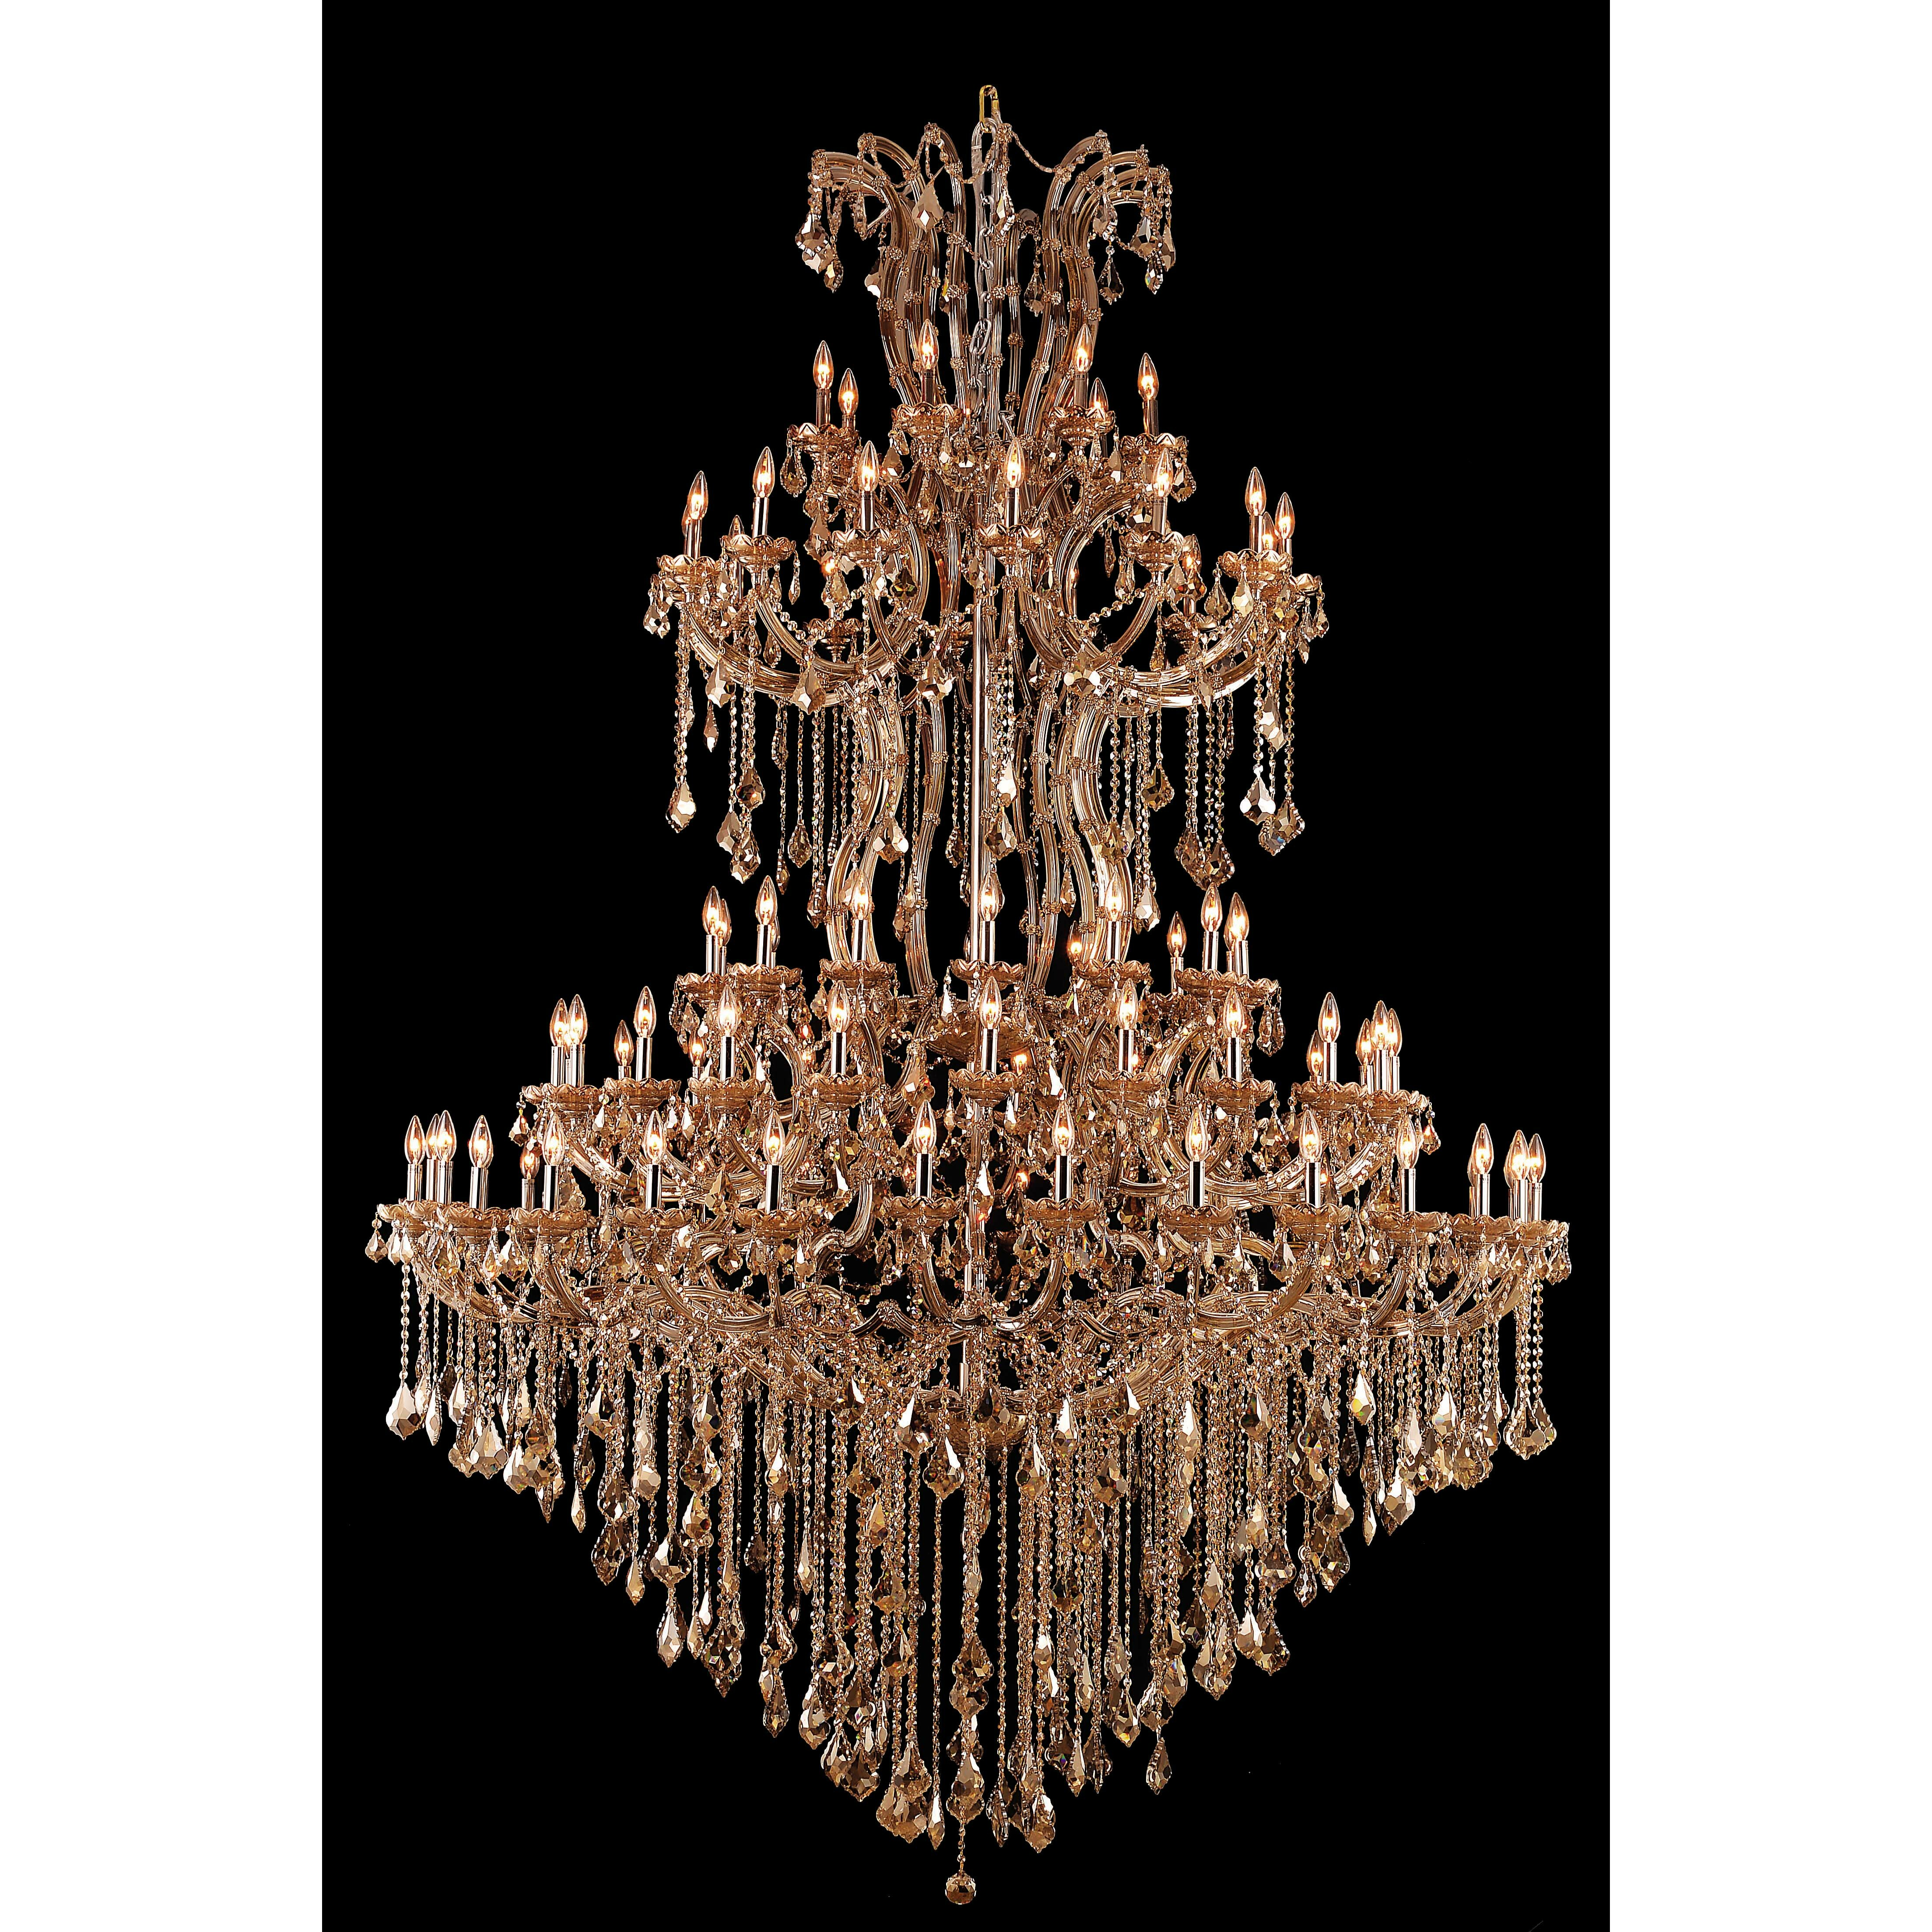 Elegant Lighting Maria Theresa 84 Light Crystal Chandelier